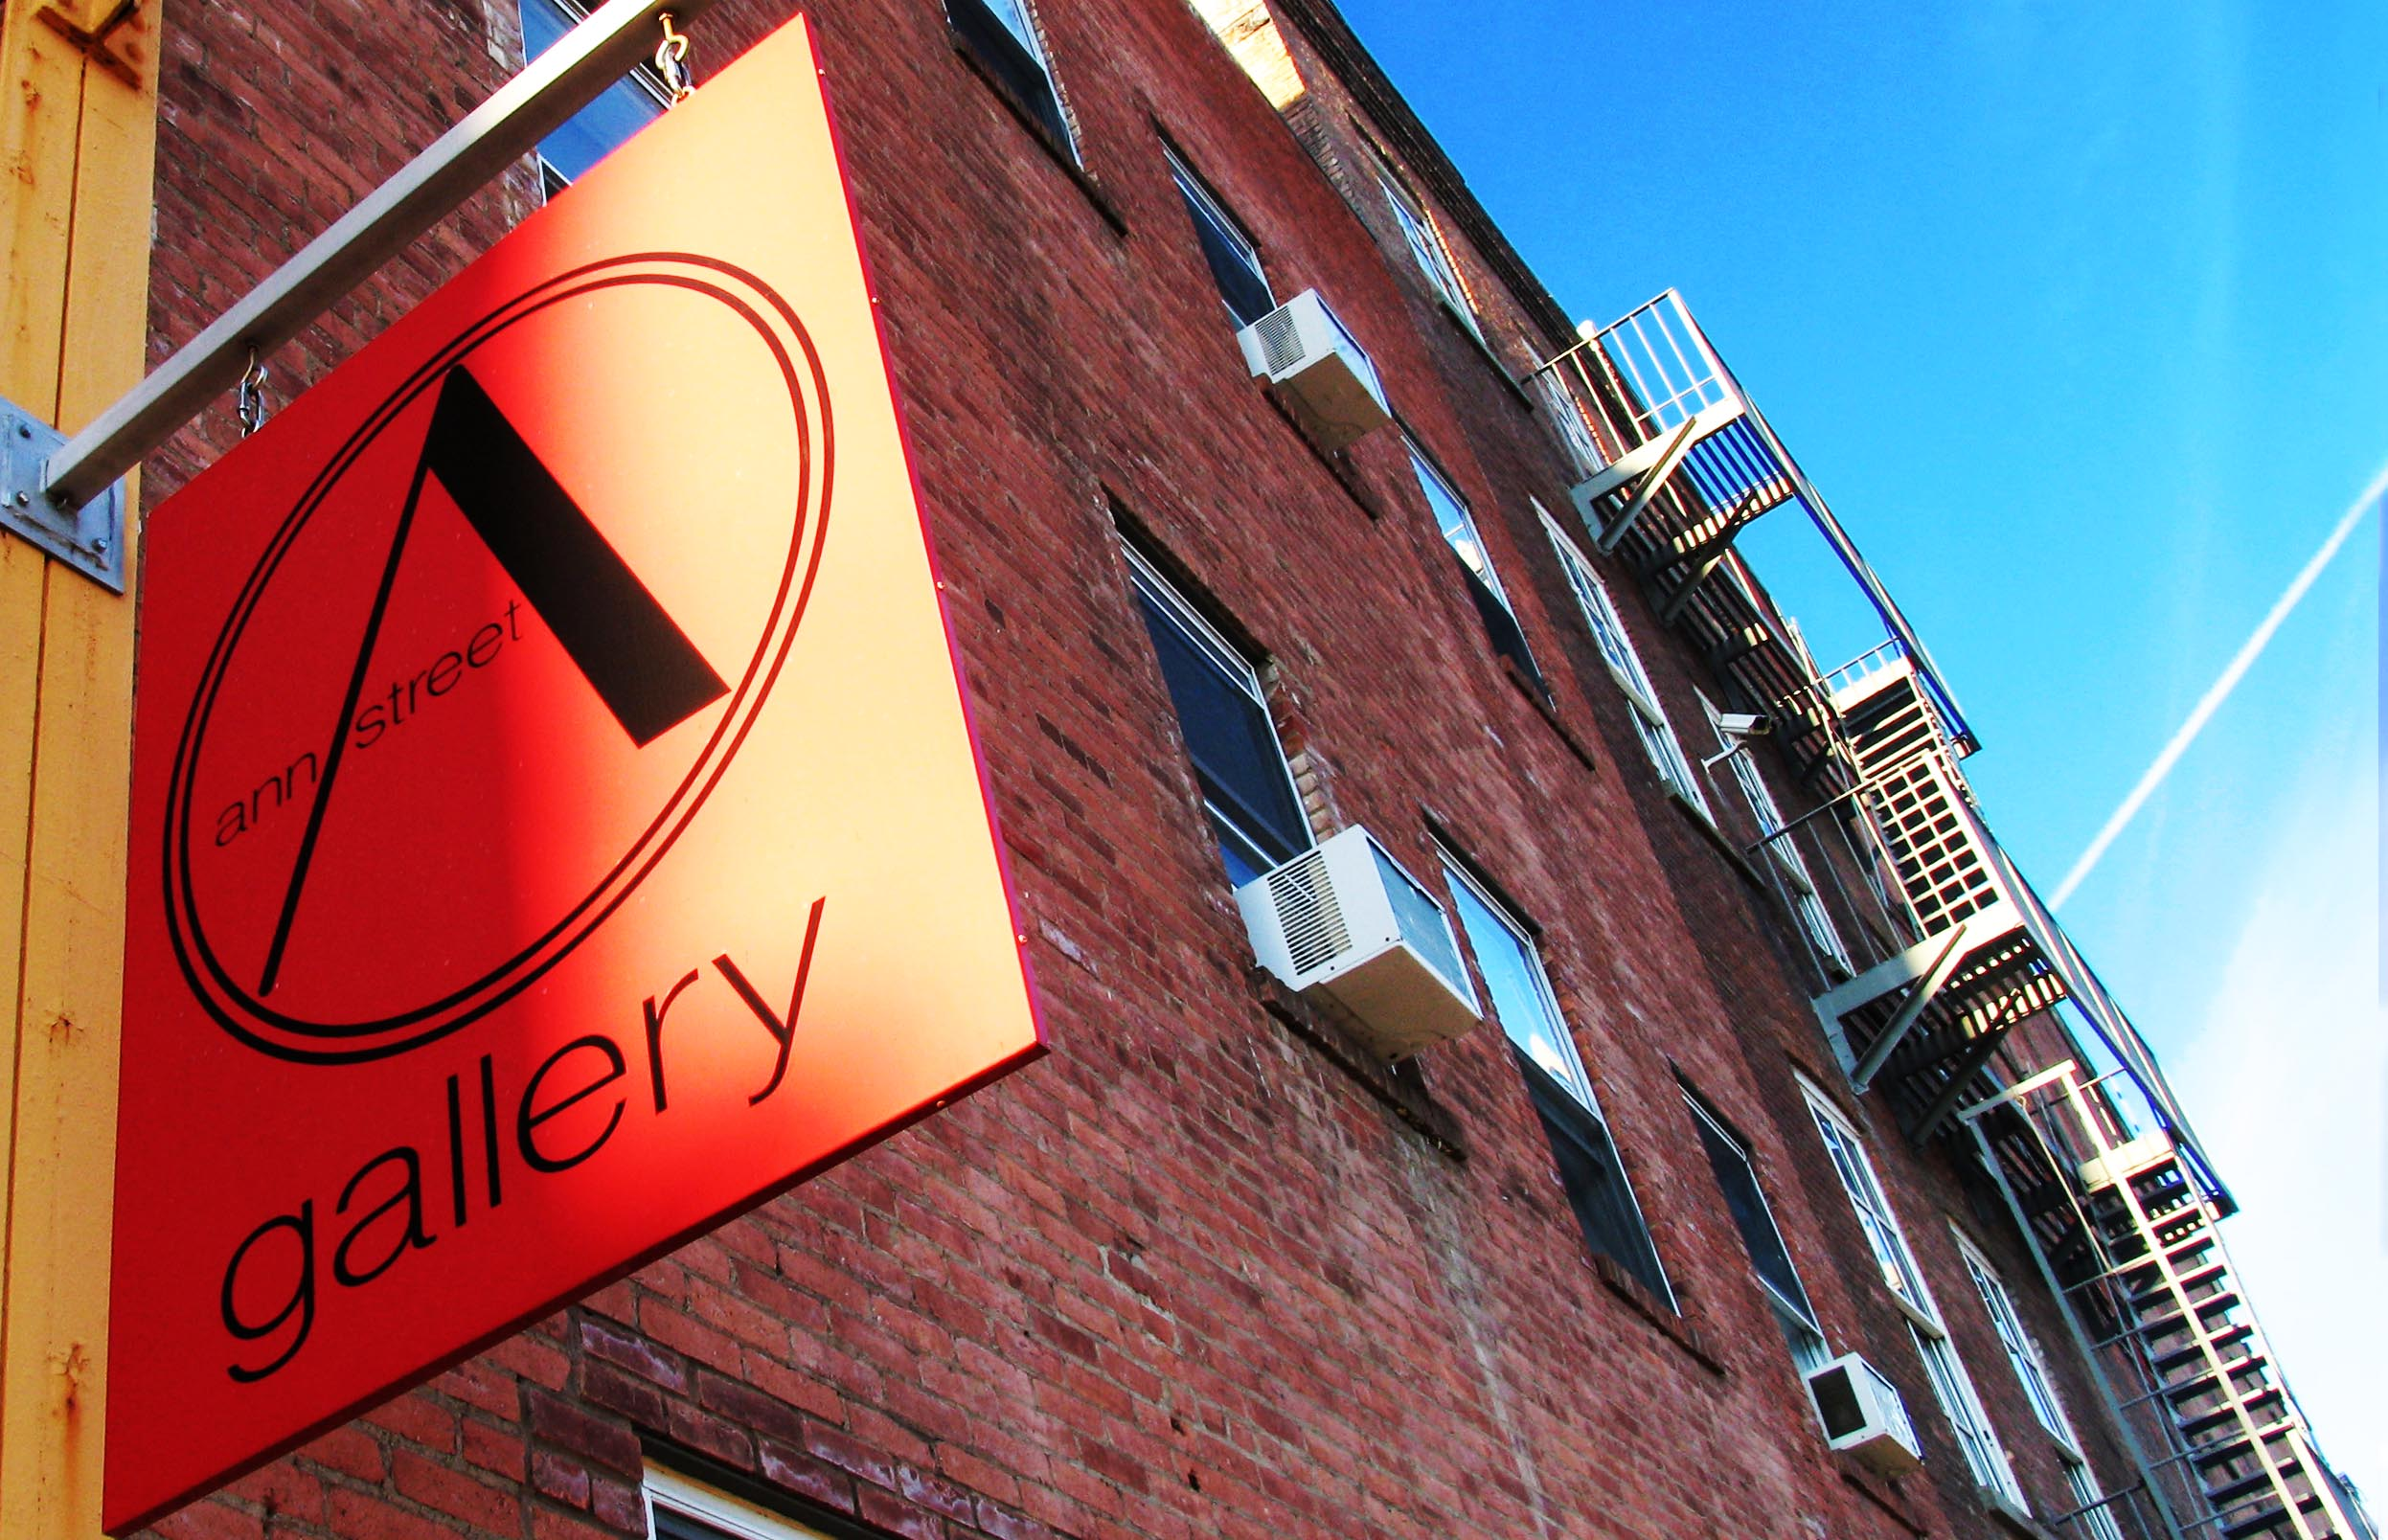 Anne Street Gallery